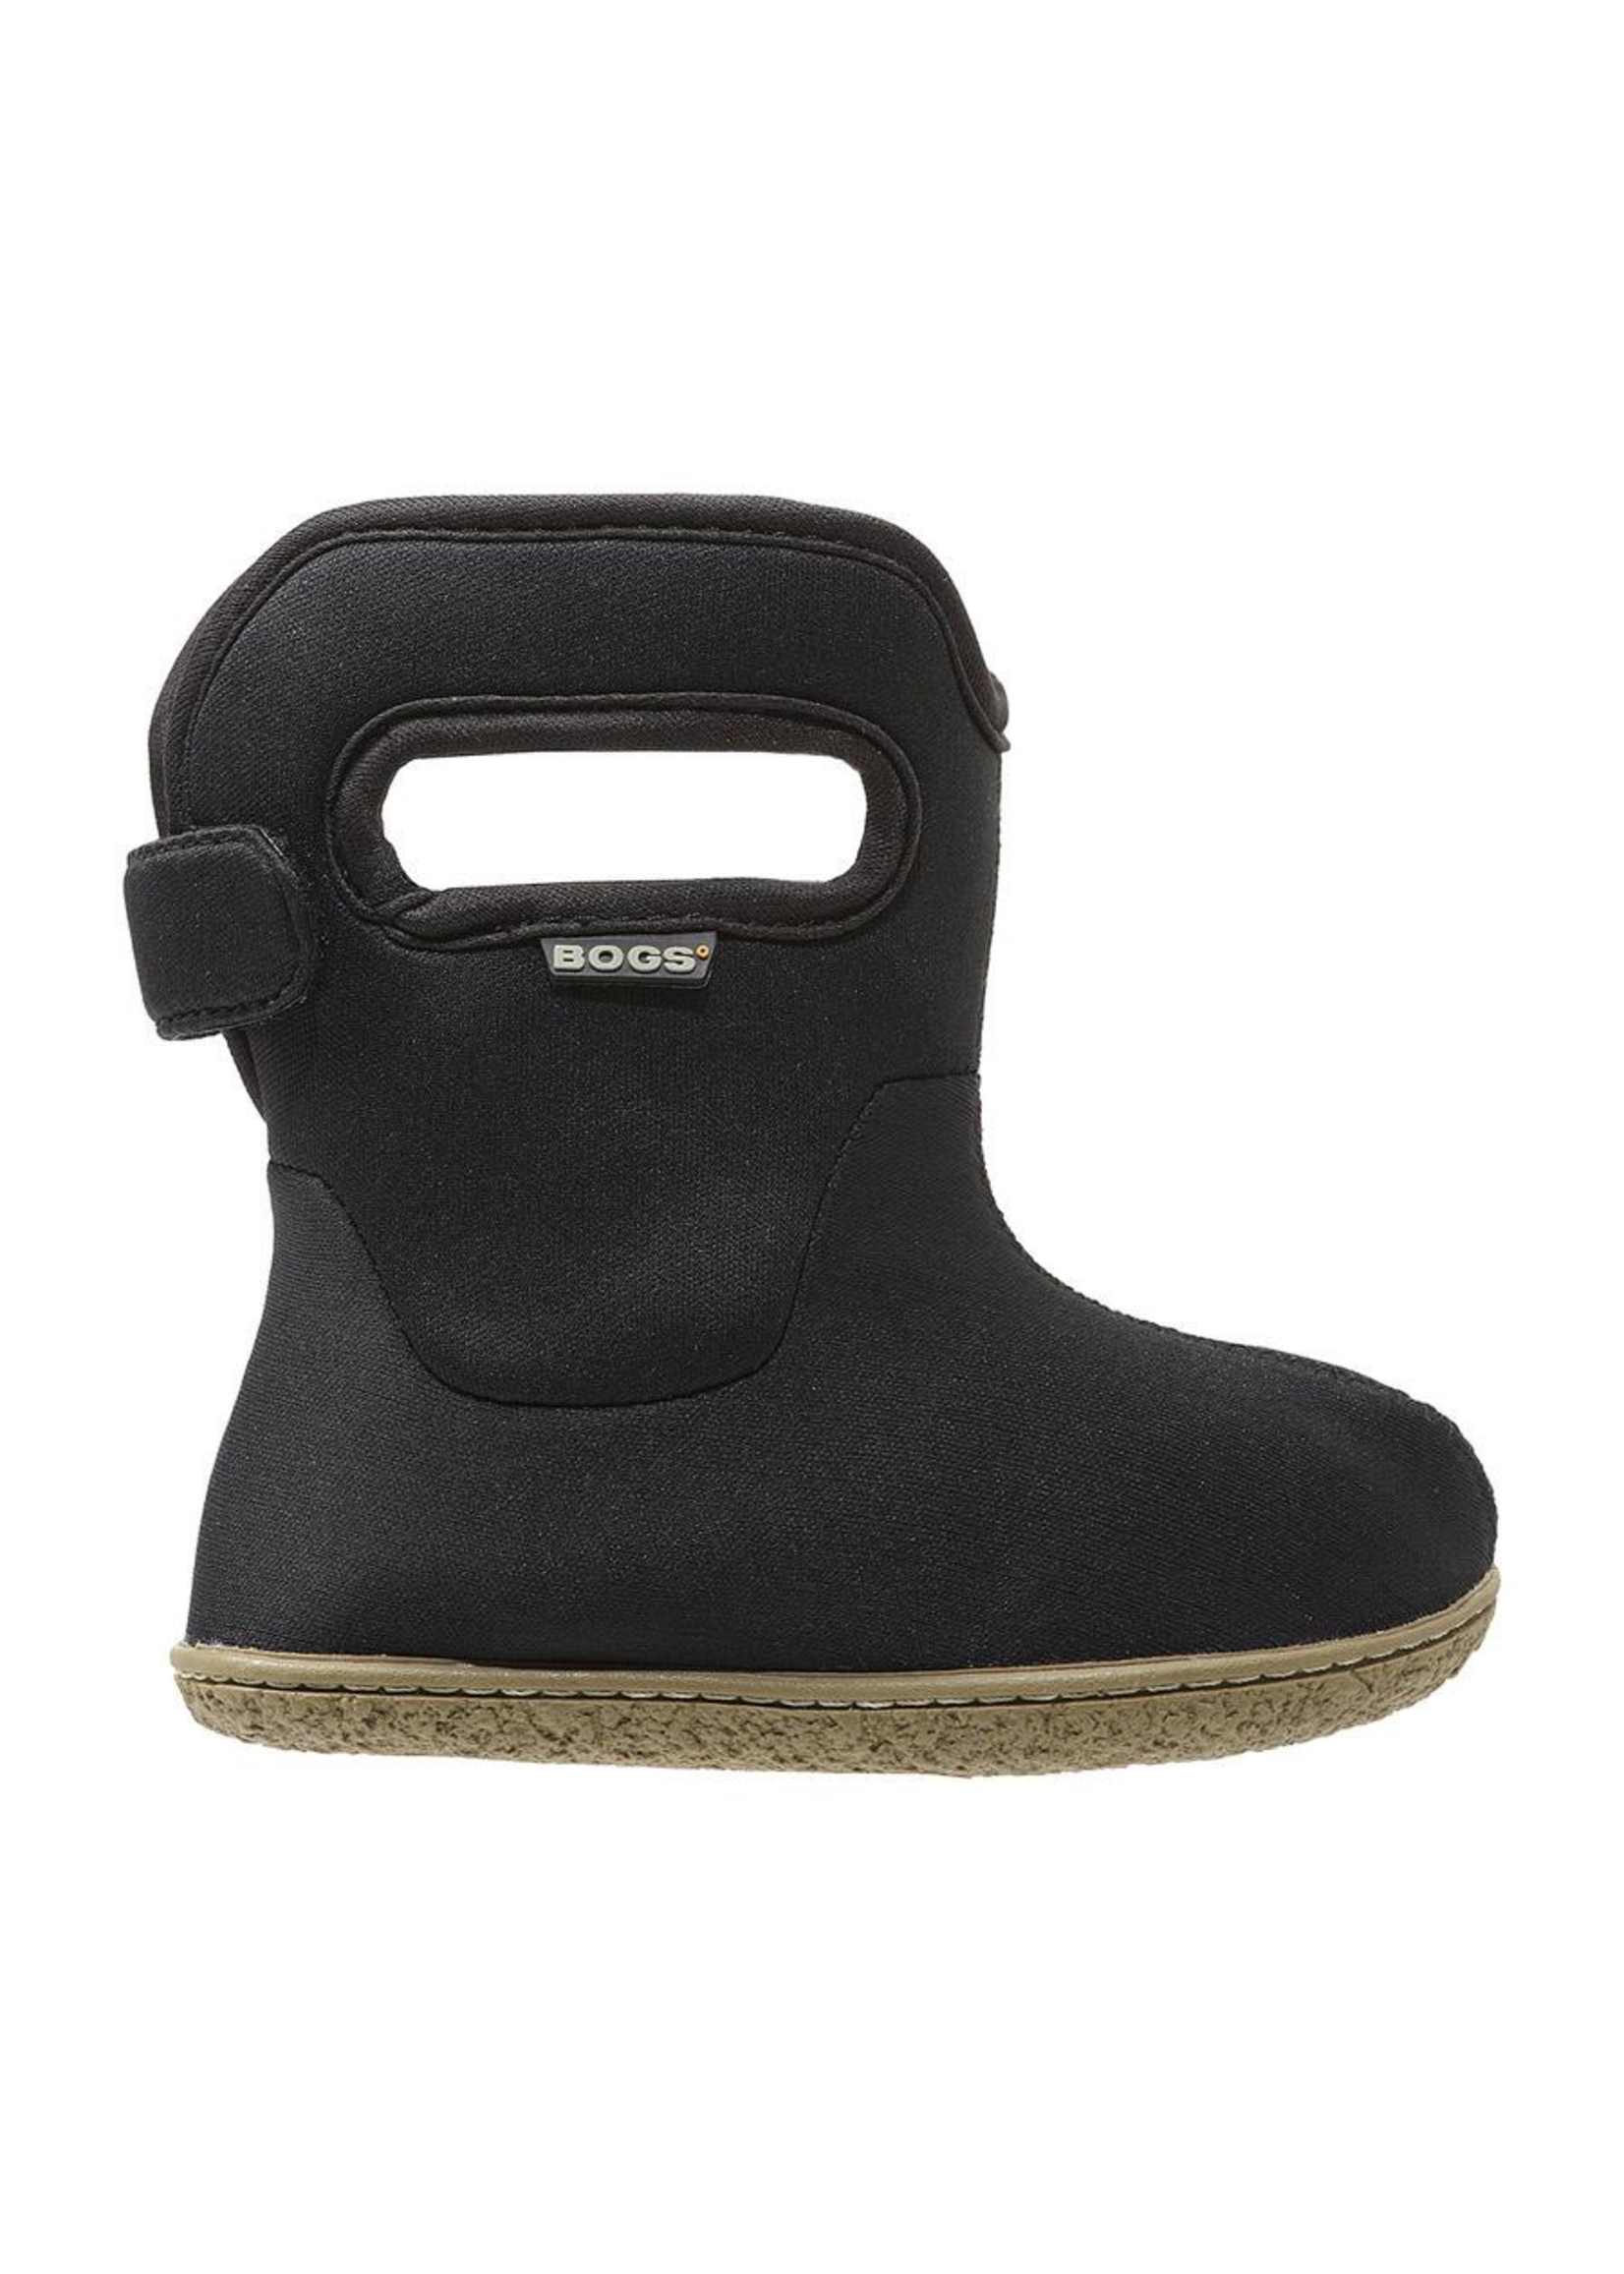 Bogs Bogs, Baby Bogs Solid Waterproof Boots